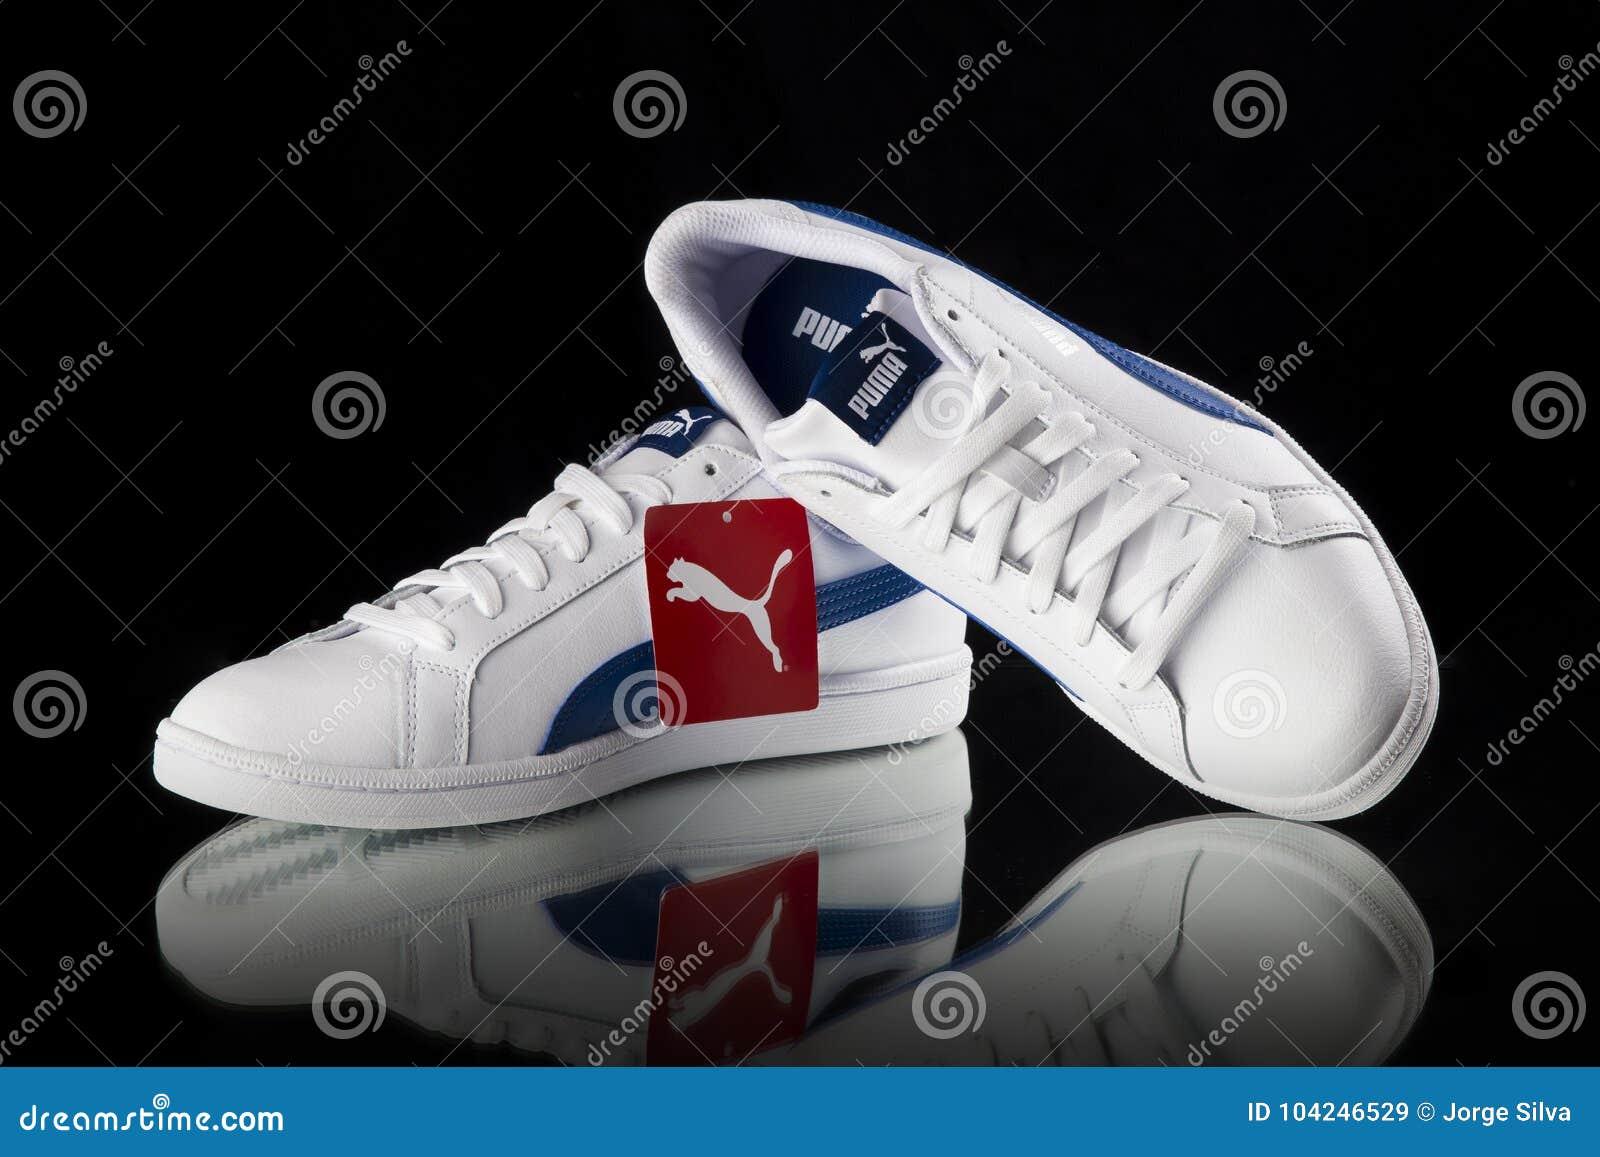 aff5197a4b Κλασικό πάνινο παπούτσι Puma Εκδοτική Στοκ Εικόνα - εικόνα από πόδι ...